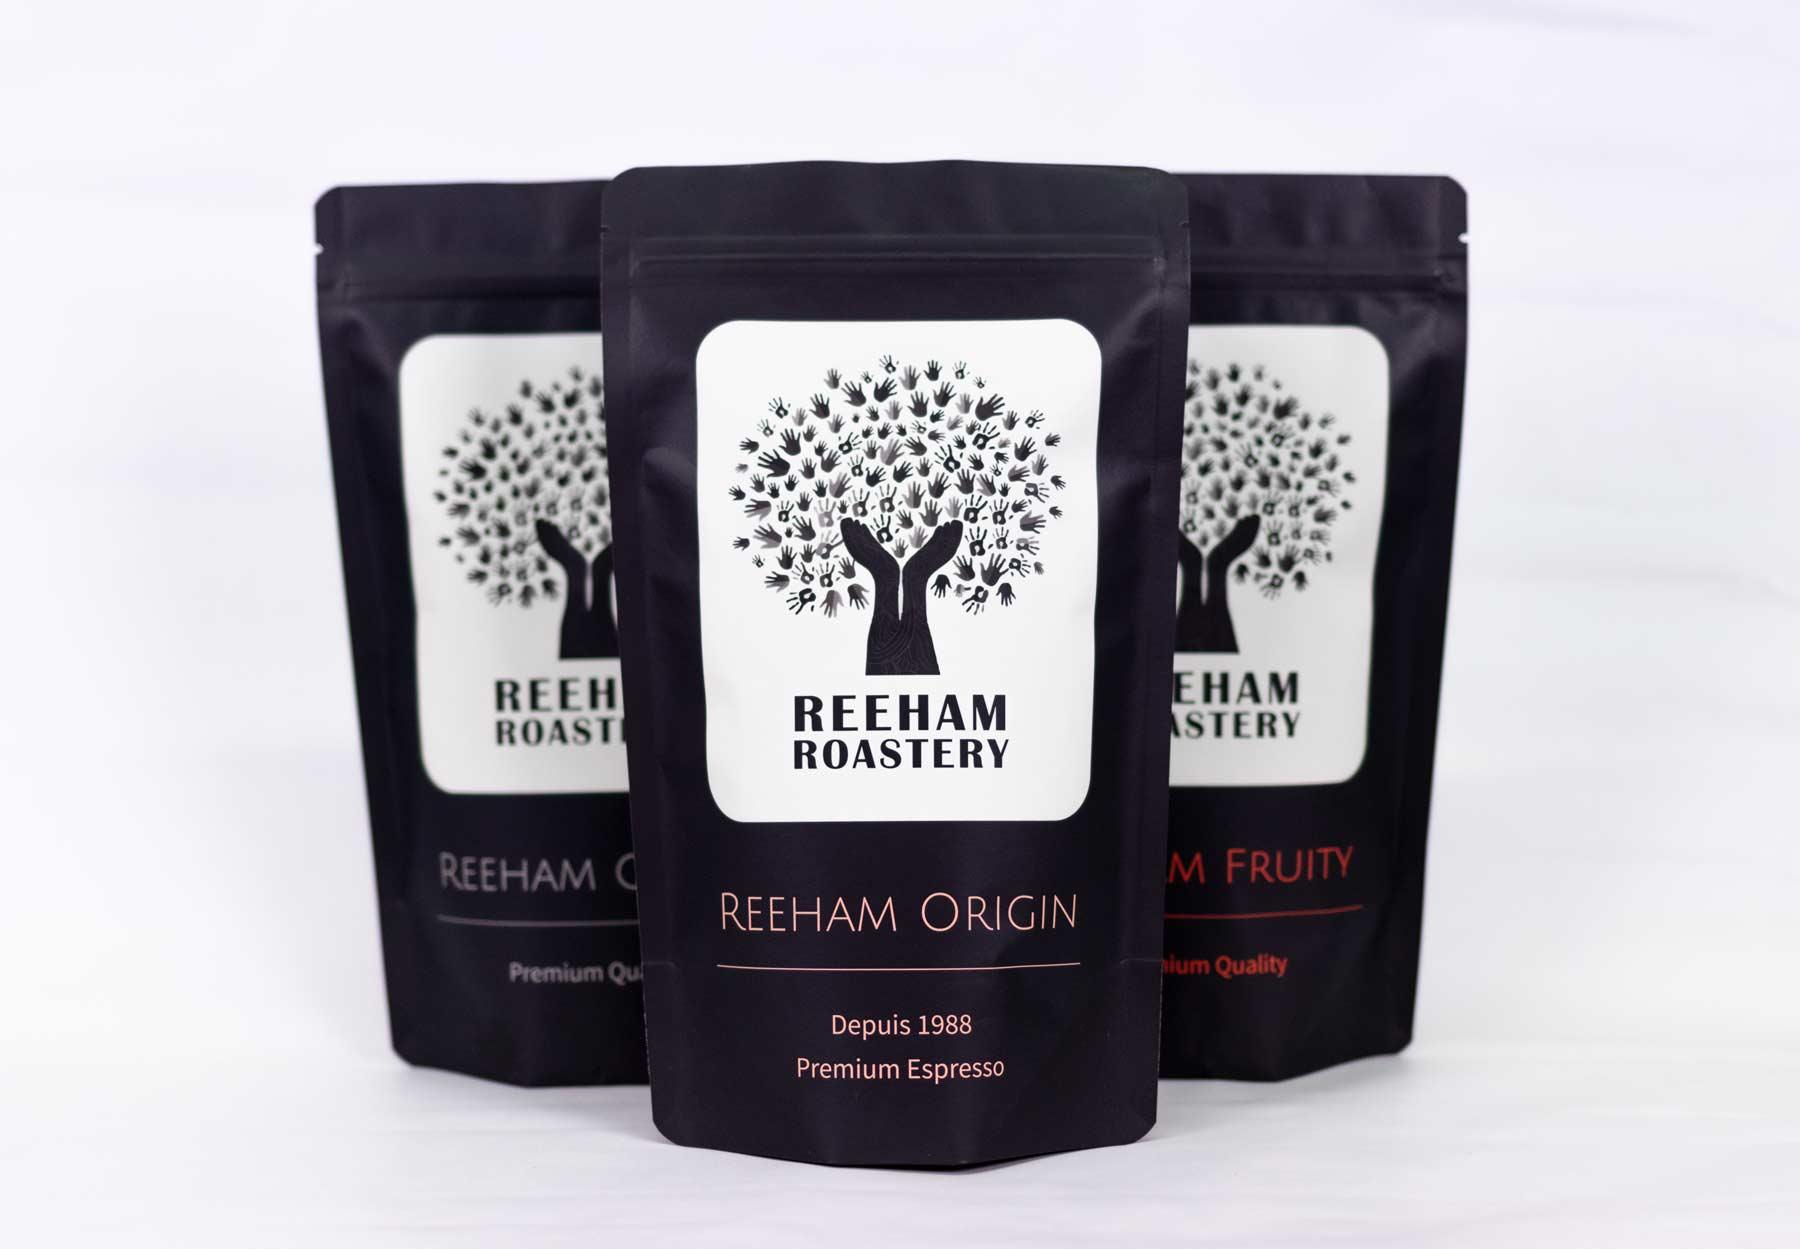 Reeham Specialty Kaffee